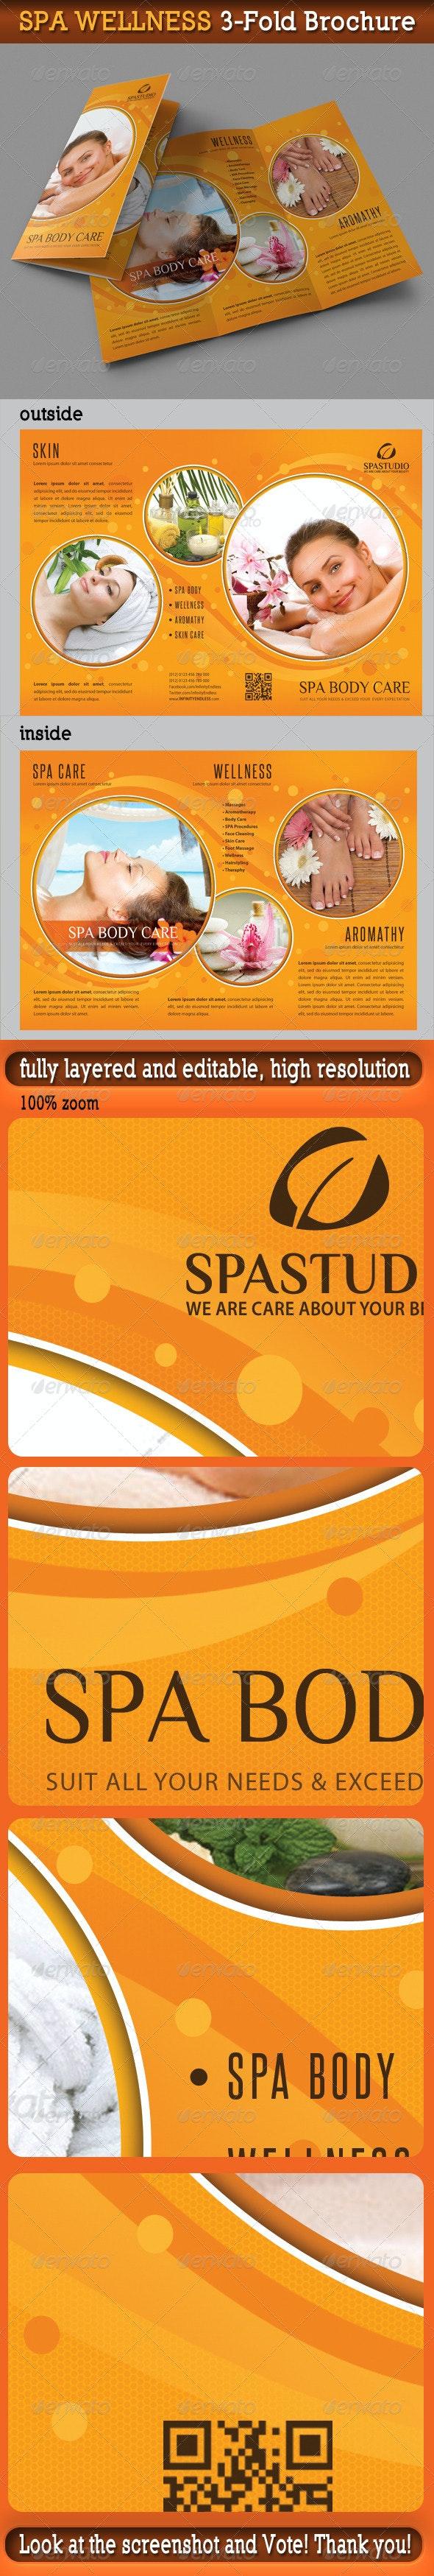 Spa Wellness 3-Fold Brochure 01 - Informational Brochures